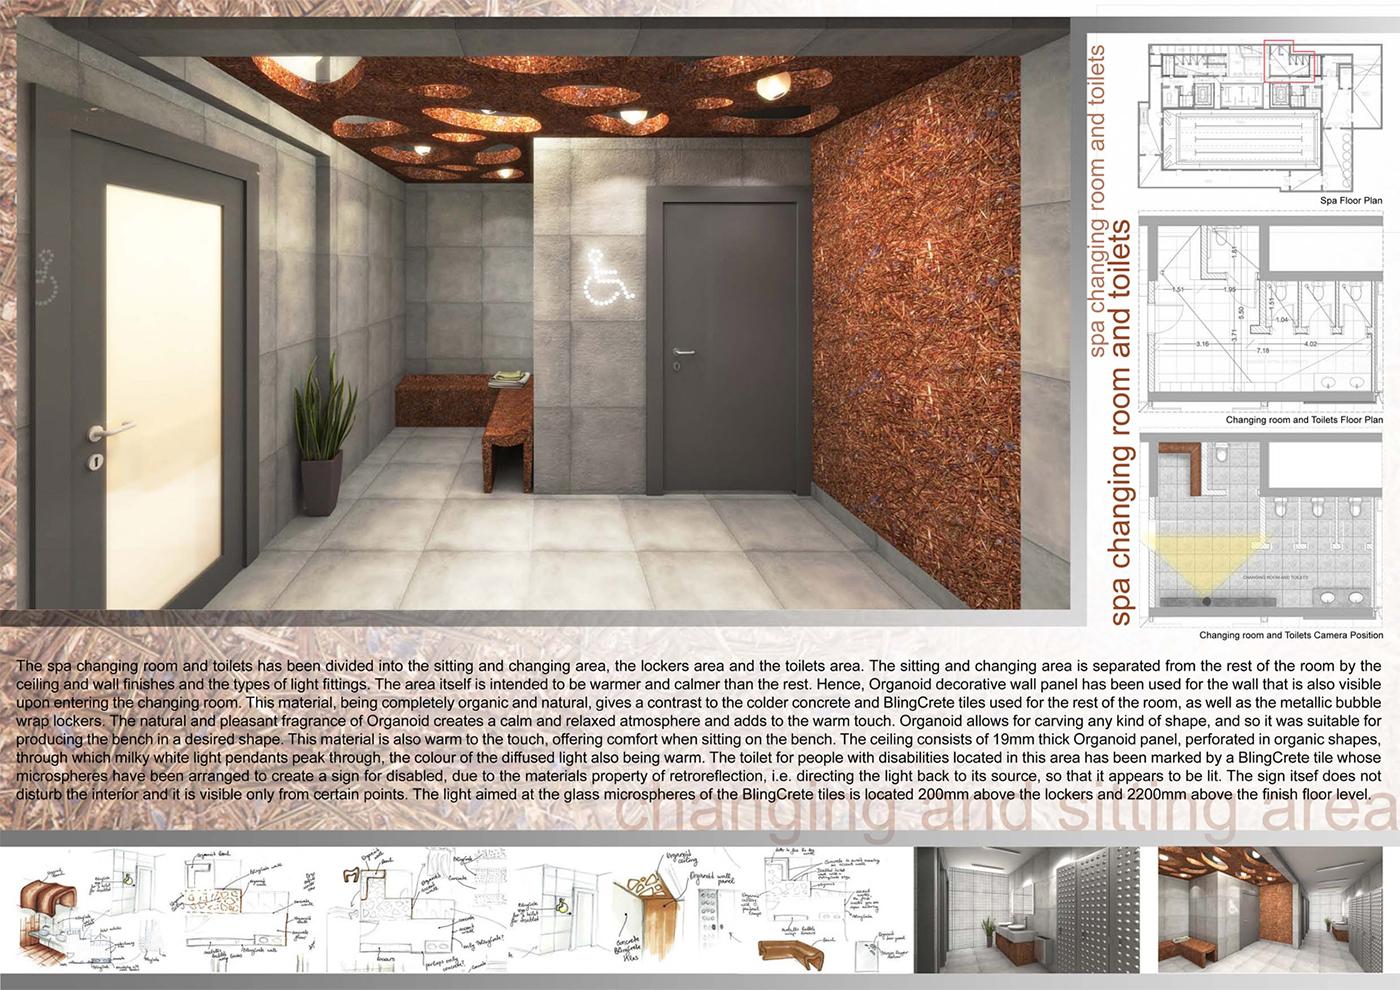 ba hons interior design uk news wilkinskennedy com u2022 rh news wilkinskennedy com BA Hons Meaning ba hons interior design uwe